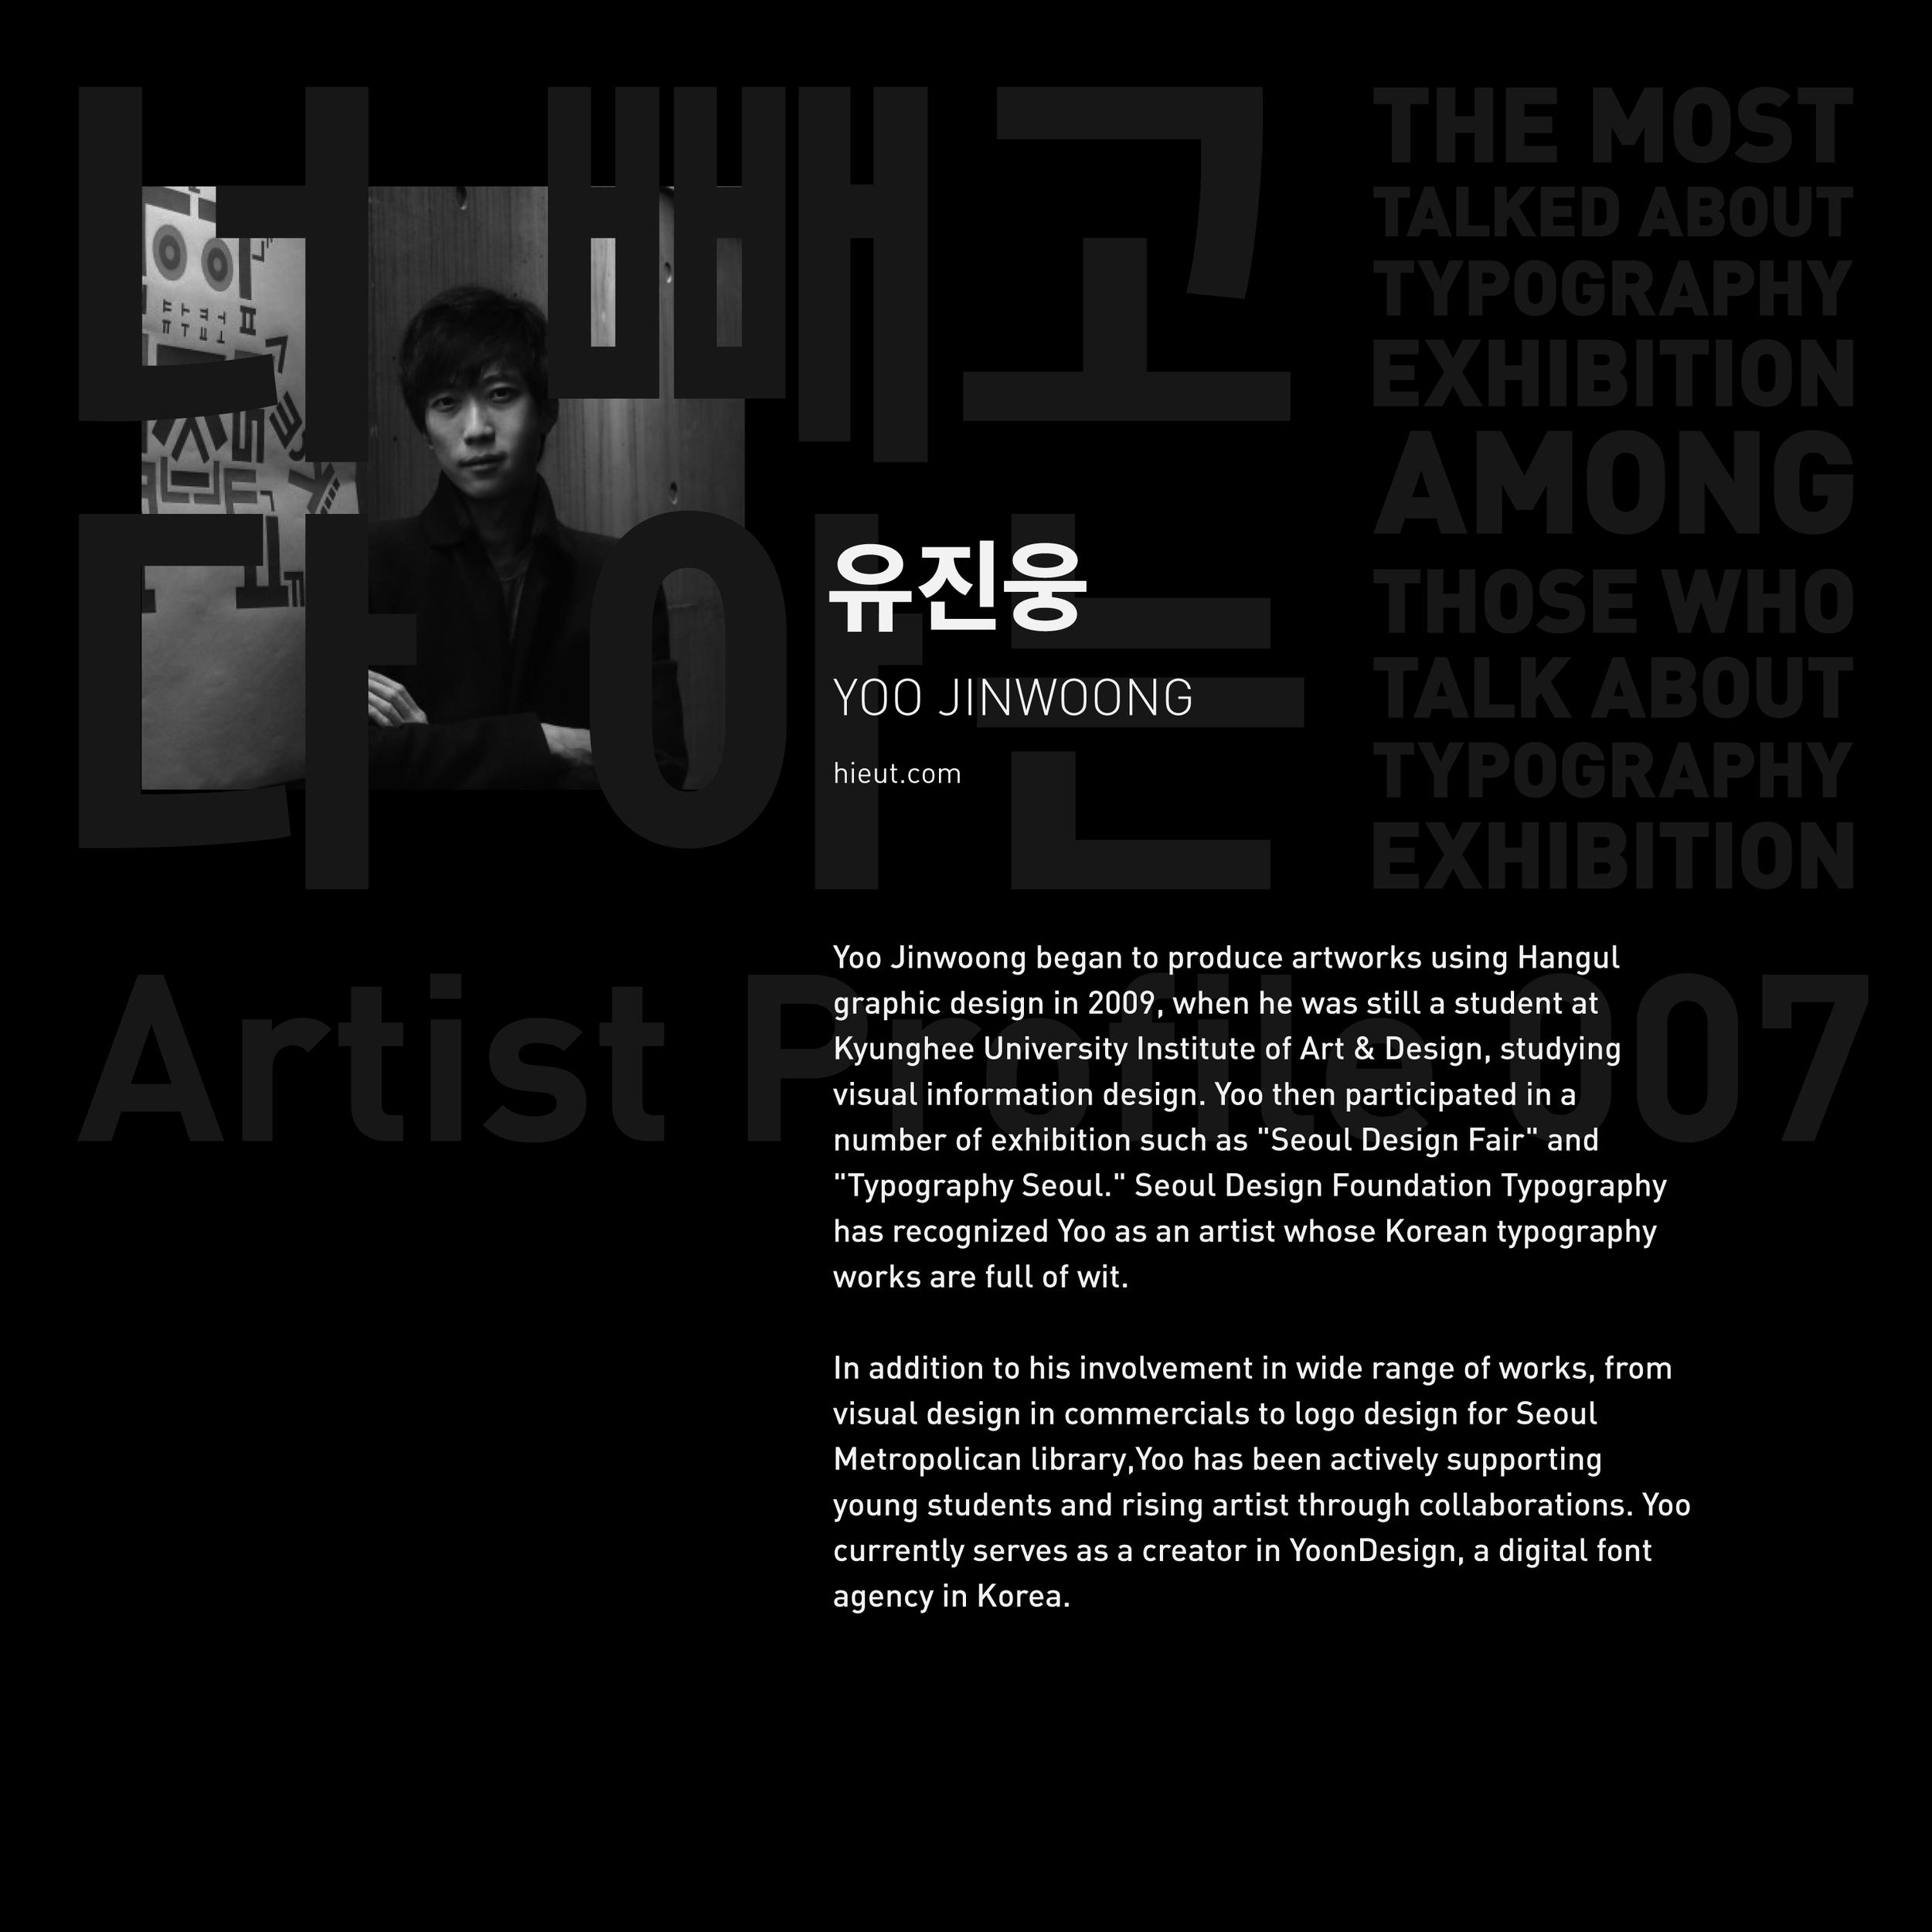 KoreanTypeExhibit_ArtistProfile_V2-07.png